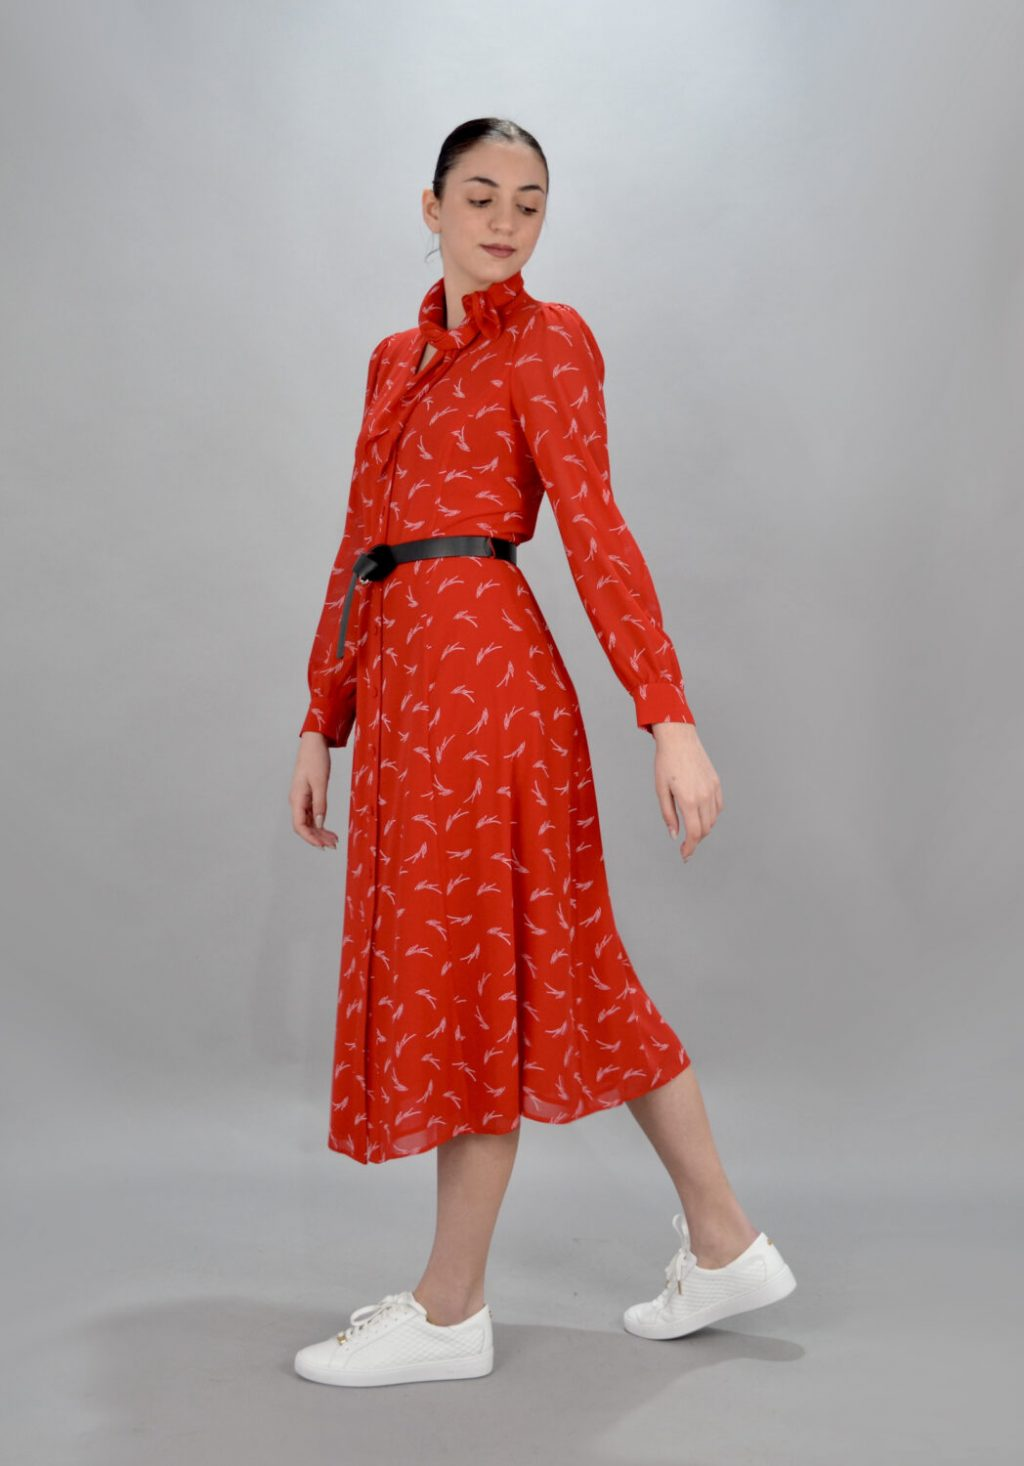 Collection Spring - Summer 2021 MICHAEL KORS SIGNATURE LOGO DRESS